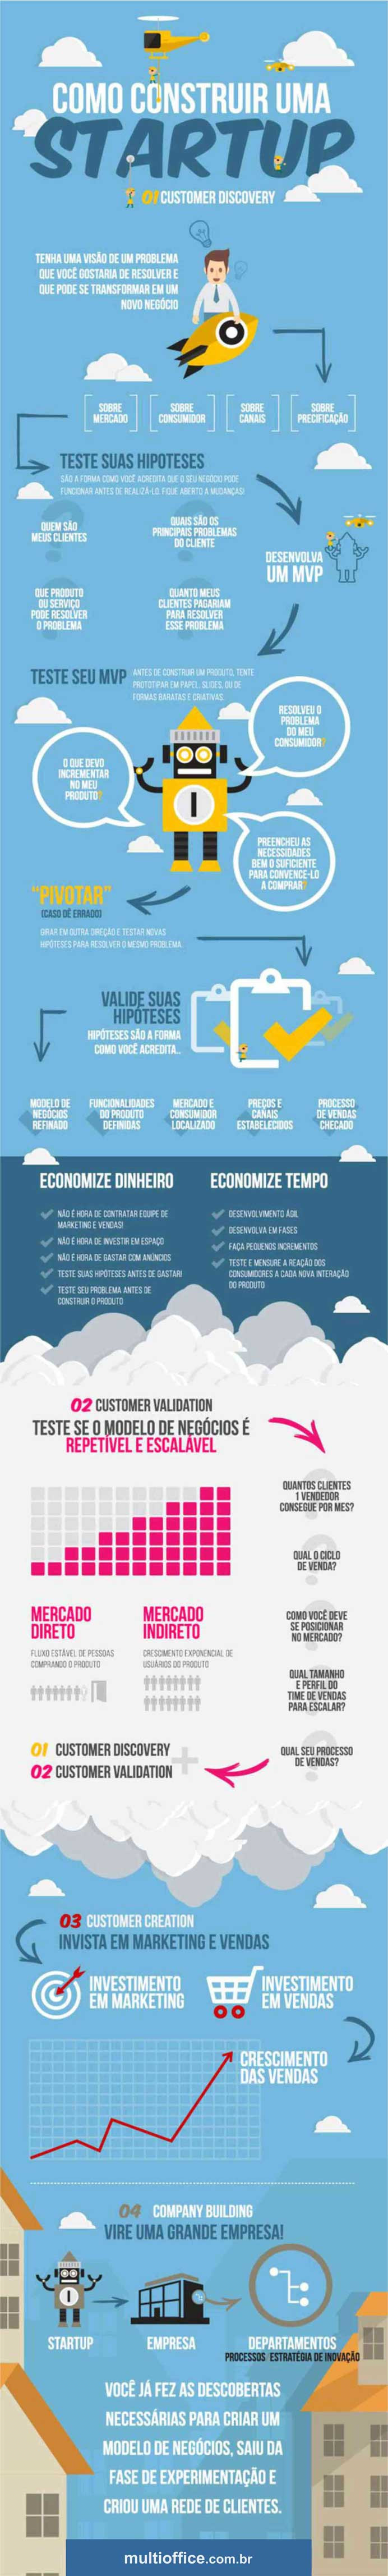 Como construir sua Startup - Apoio: Escritório Virtual Recife PE